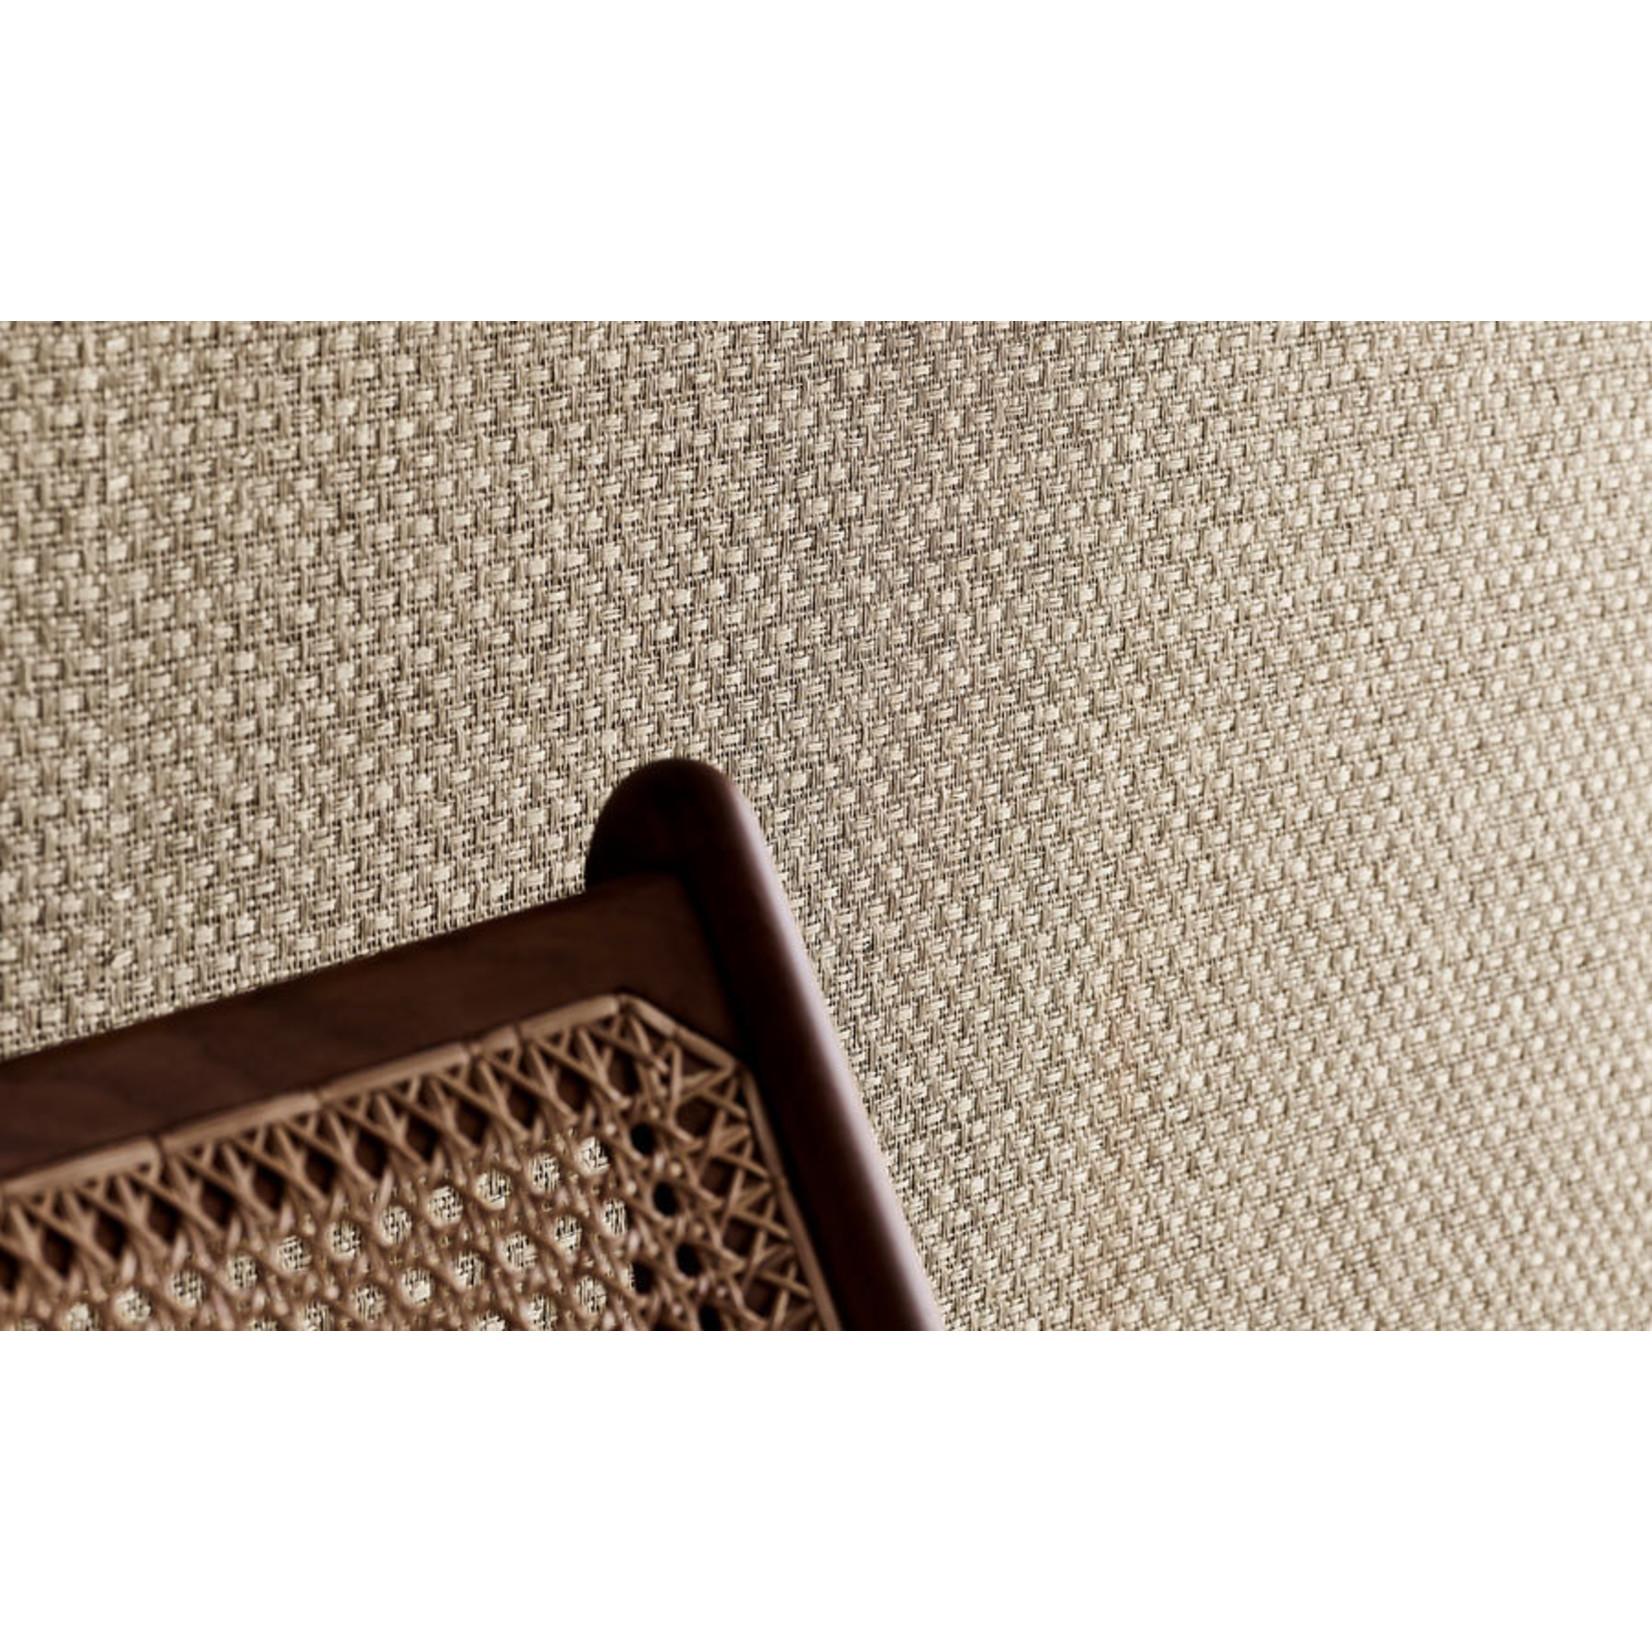 Mark Alexander Paperweave Handwoven Wallcoverings | Shifu Stone